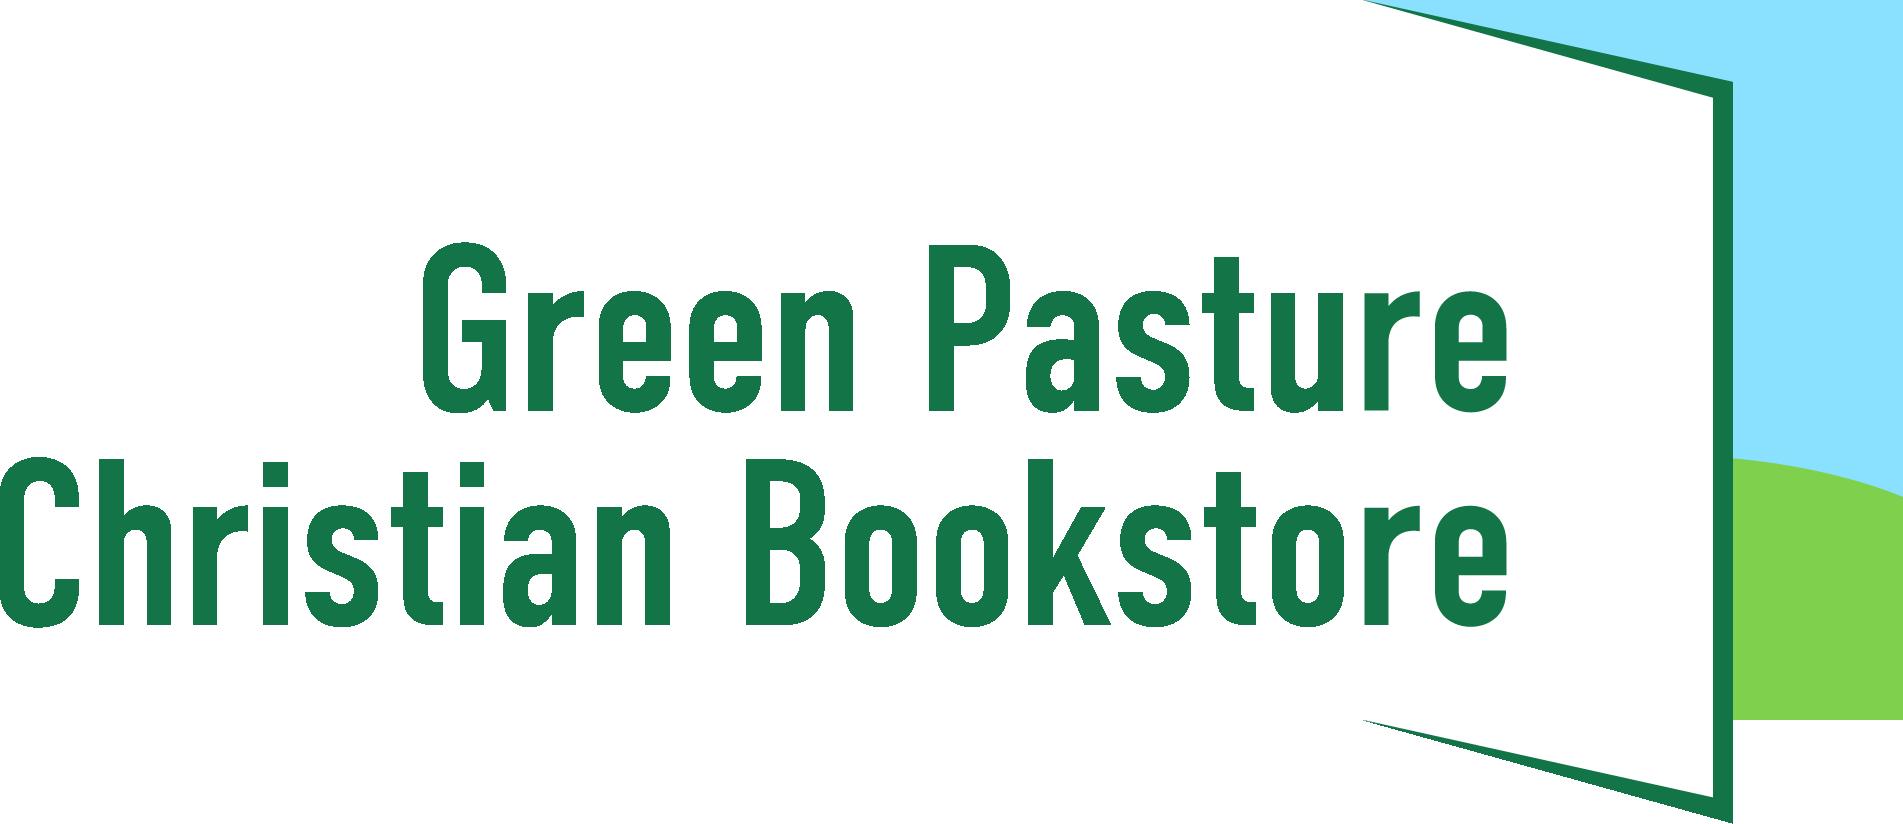 Green Pasture Christian Bookstore Logo